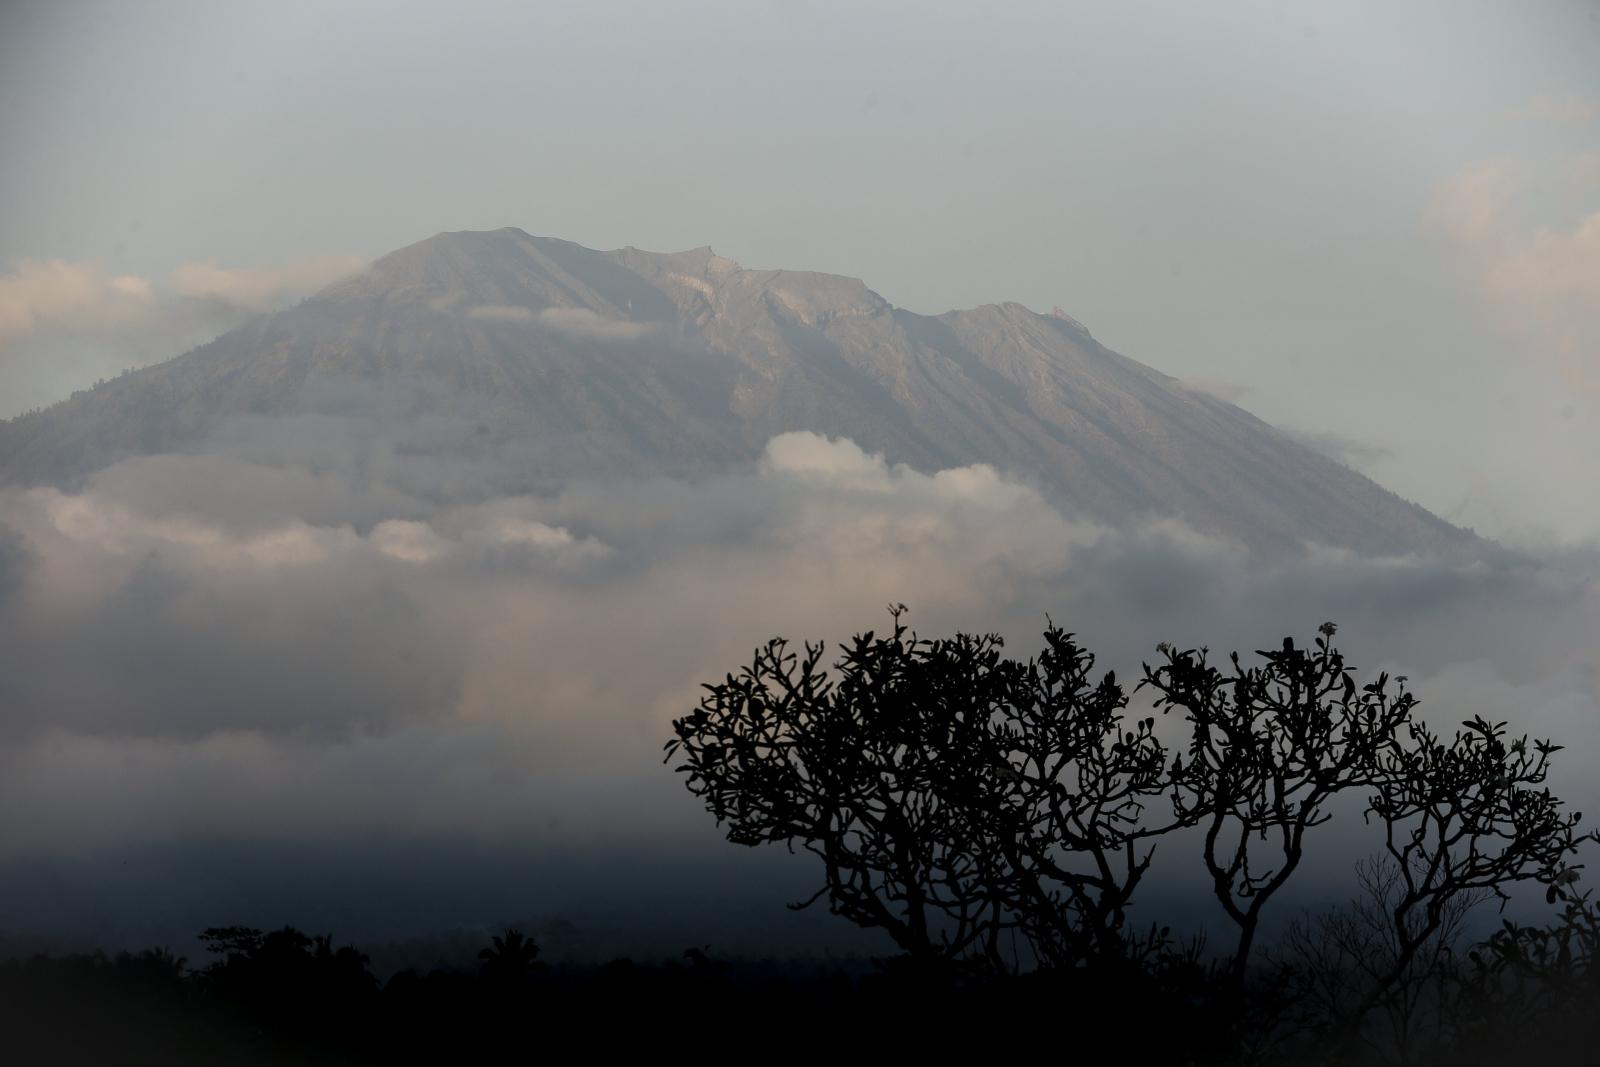 Wzrost aktywności wulkanu Mount Agung w Karangasem, na Bali EPA/MADE NAGI